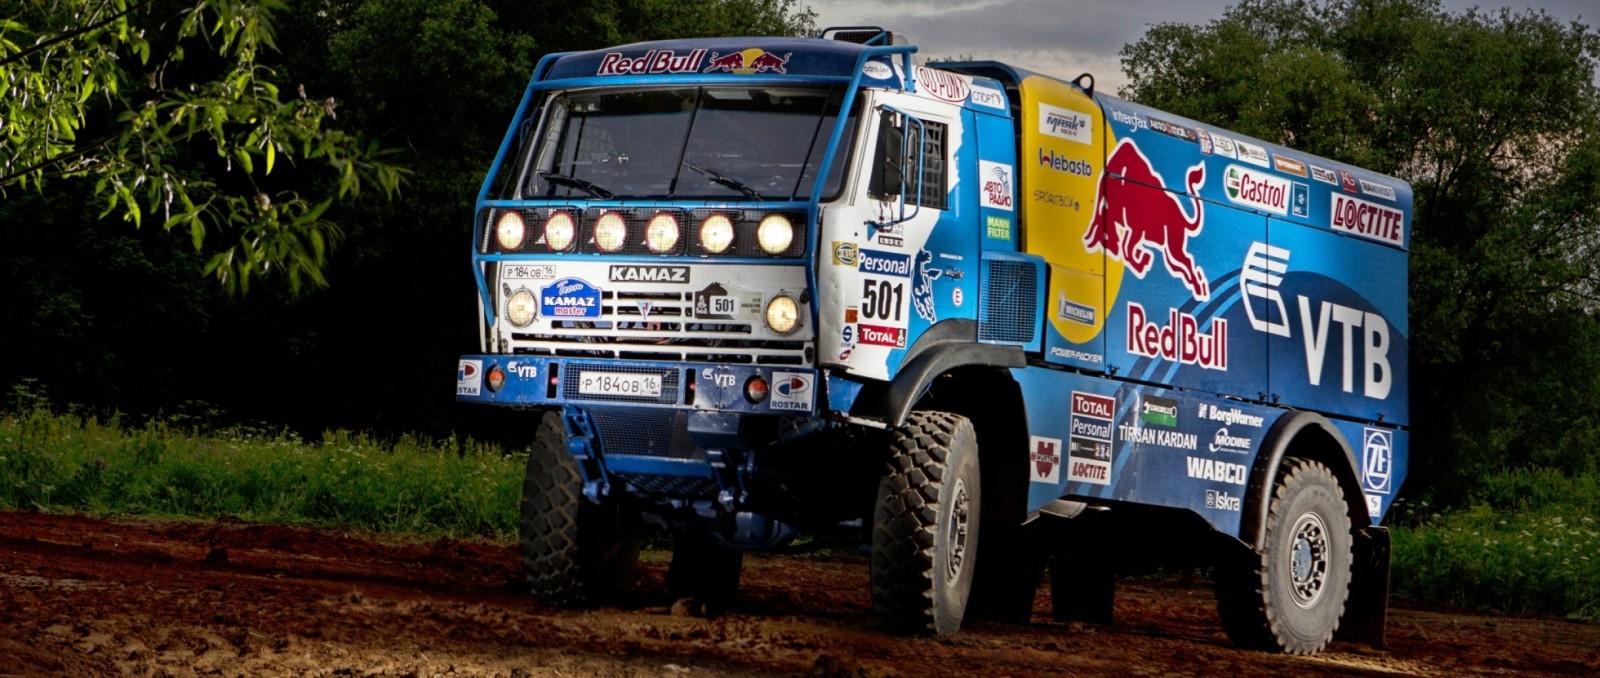 Unimog Nemesis - Red Bull KAMAZ 4911 - Dakar T4 Hero  14